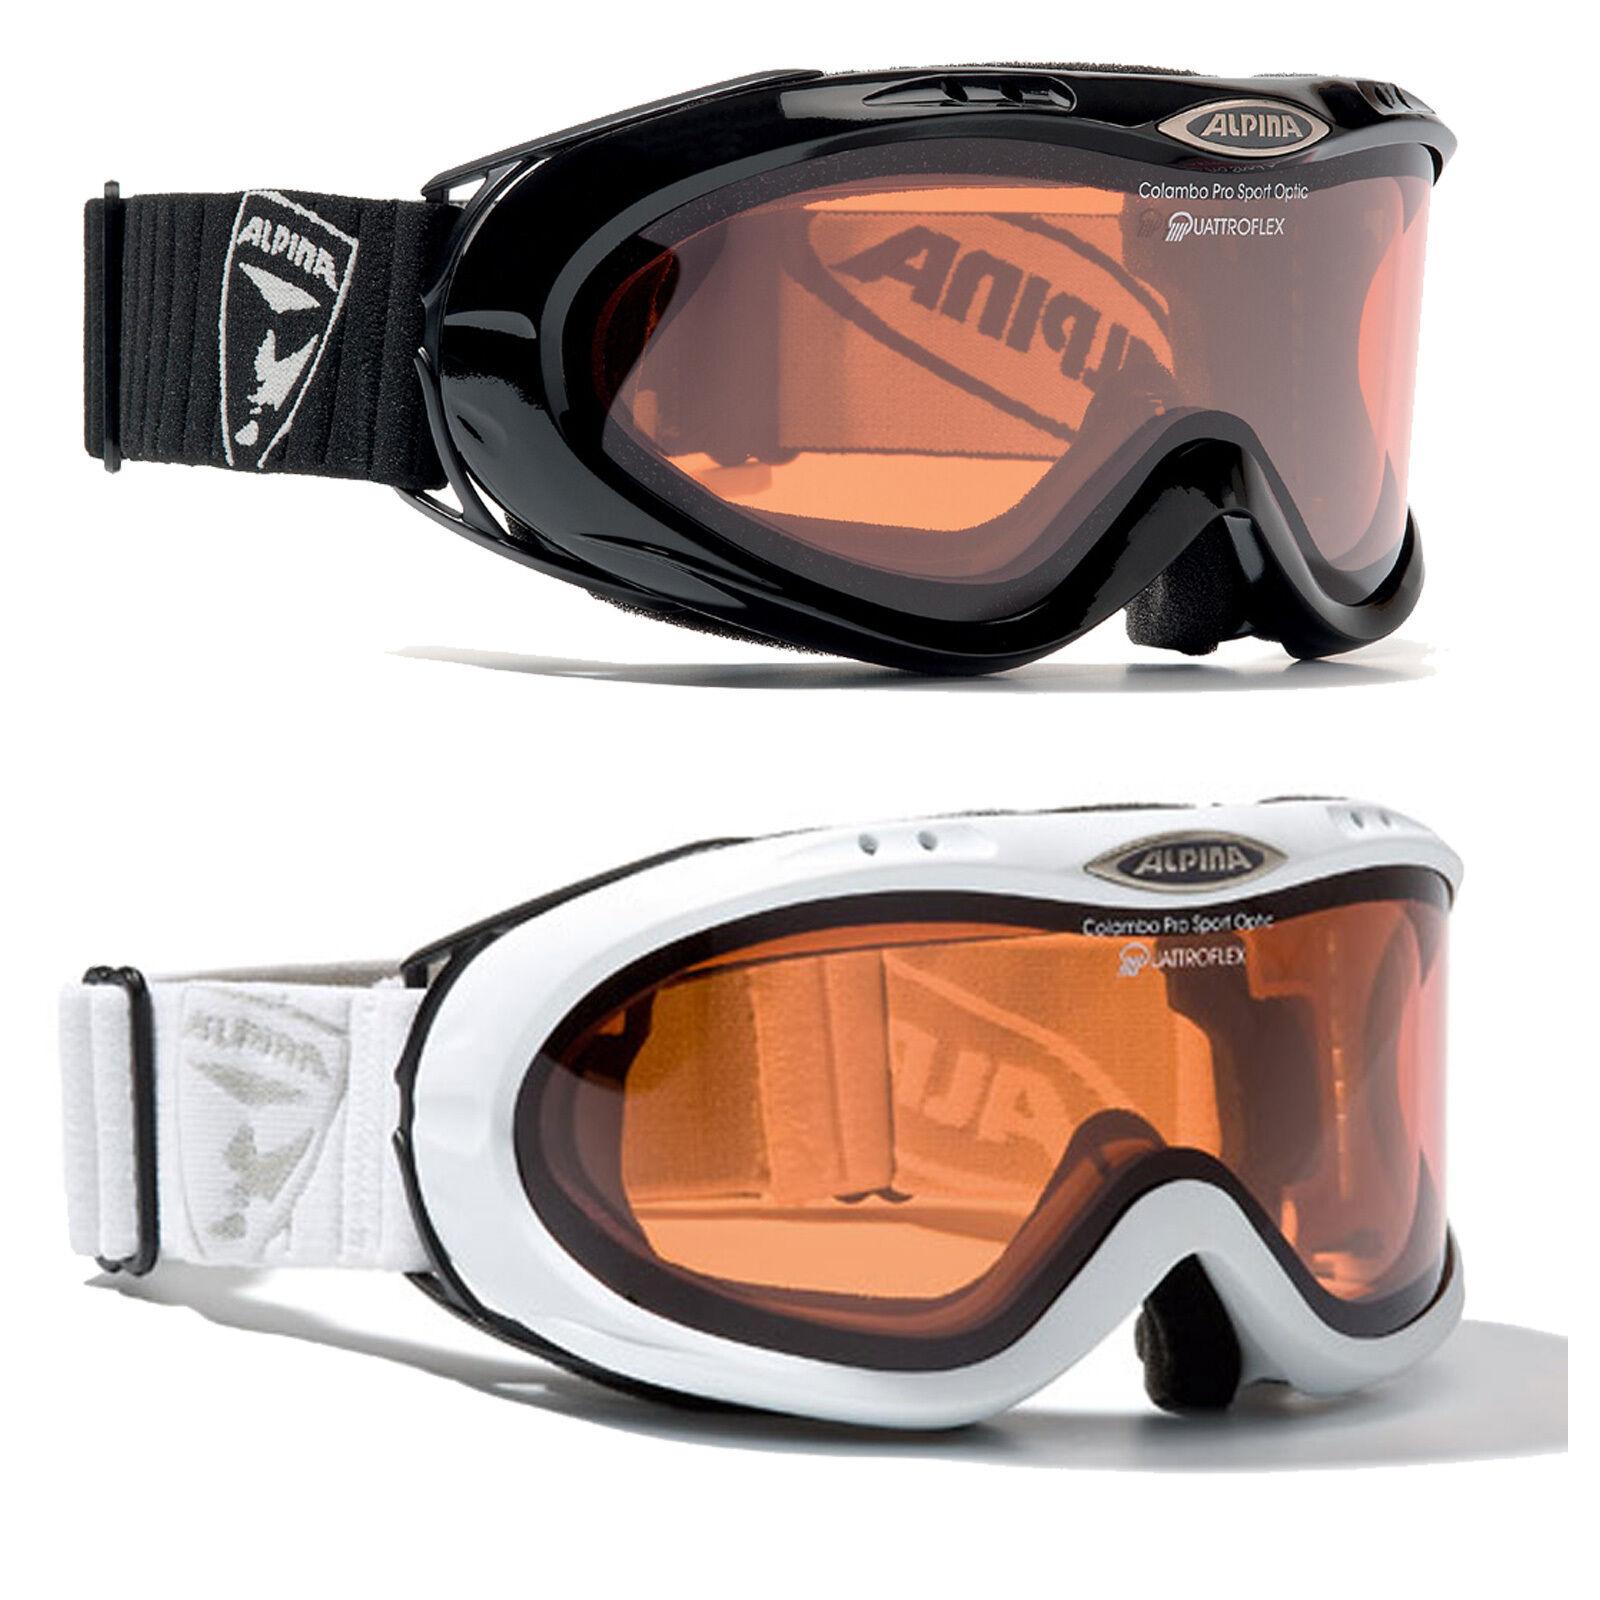 Alpina Colambo - - - Skibrille Snowboardbrille Goggle Quattroflex f124cc